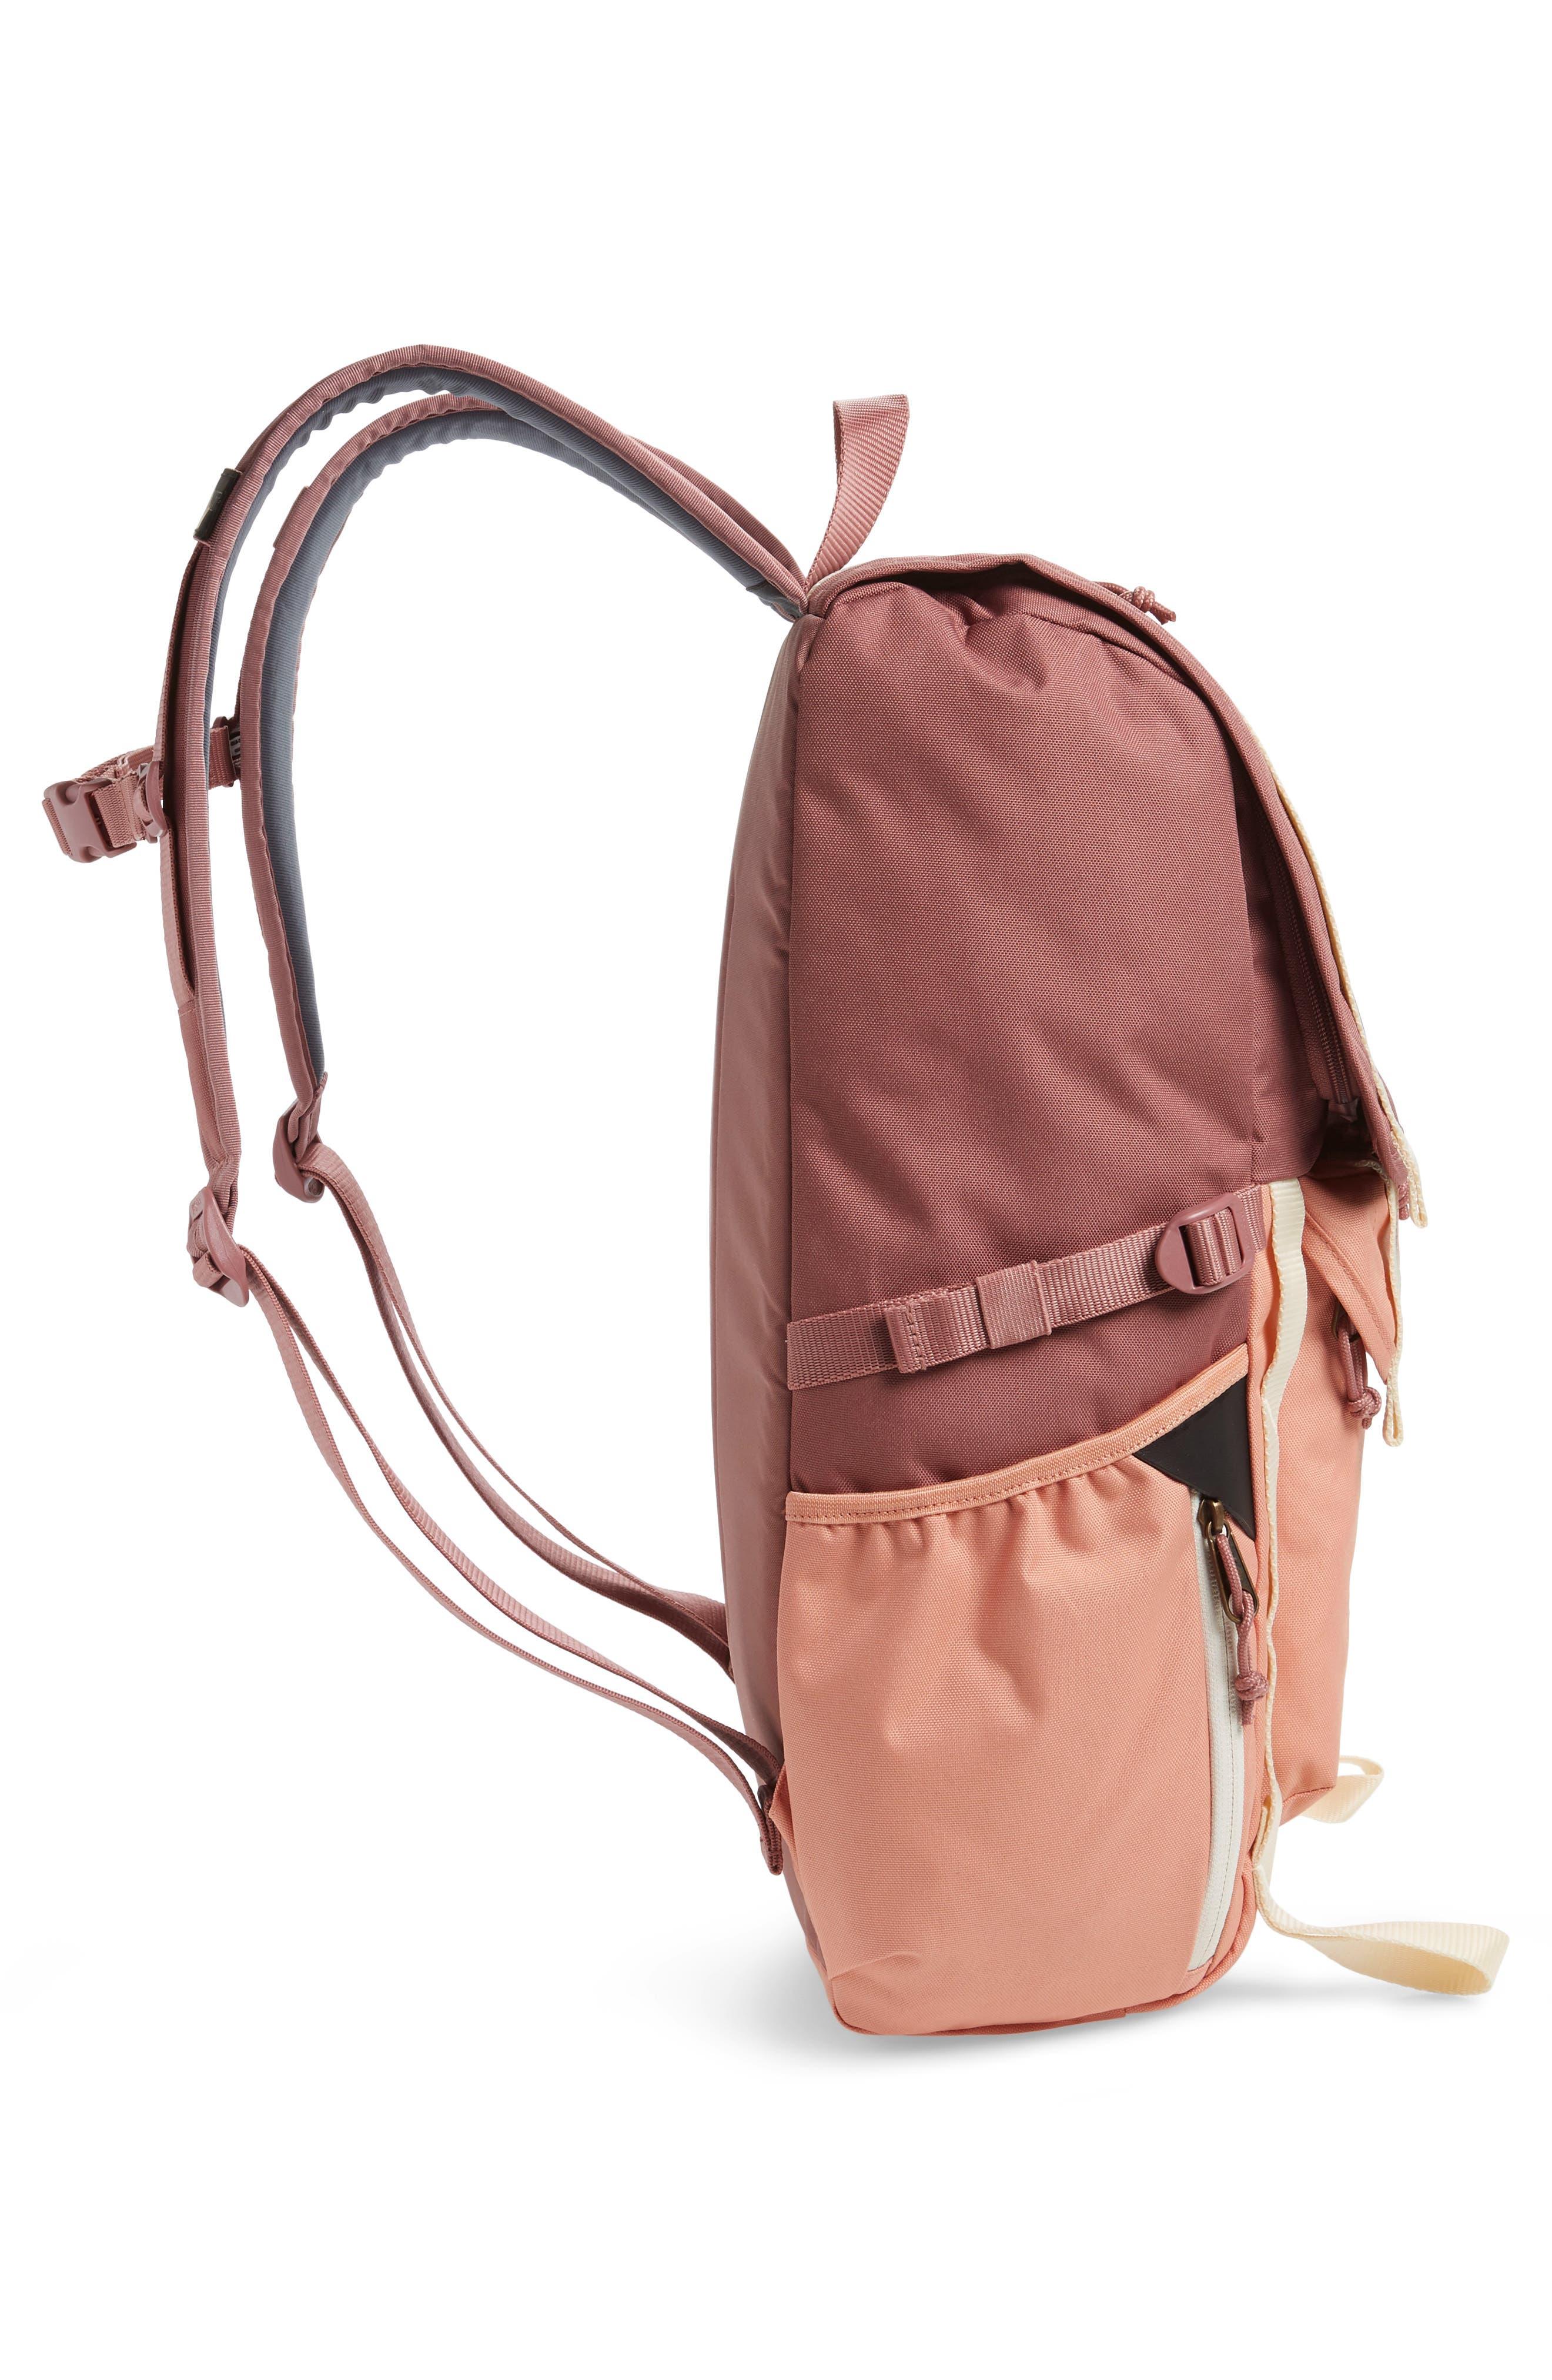 JANSPORT, Hatchet Backpack, Alternate thumbnail 6, color, MOCHA/ CLAY